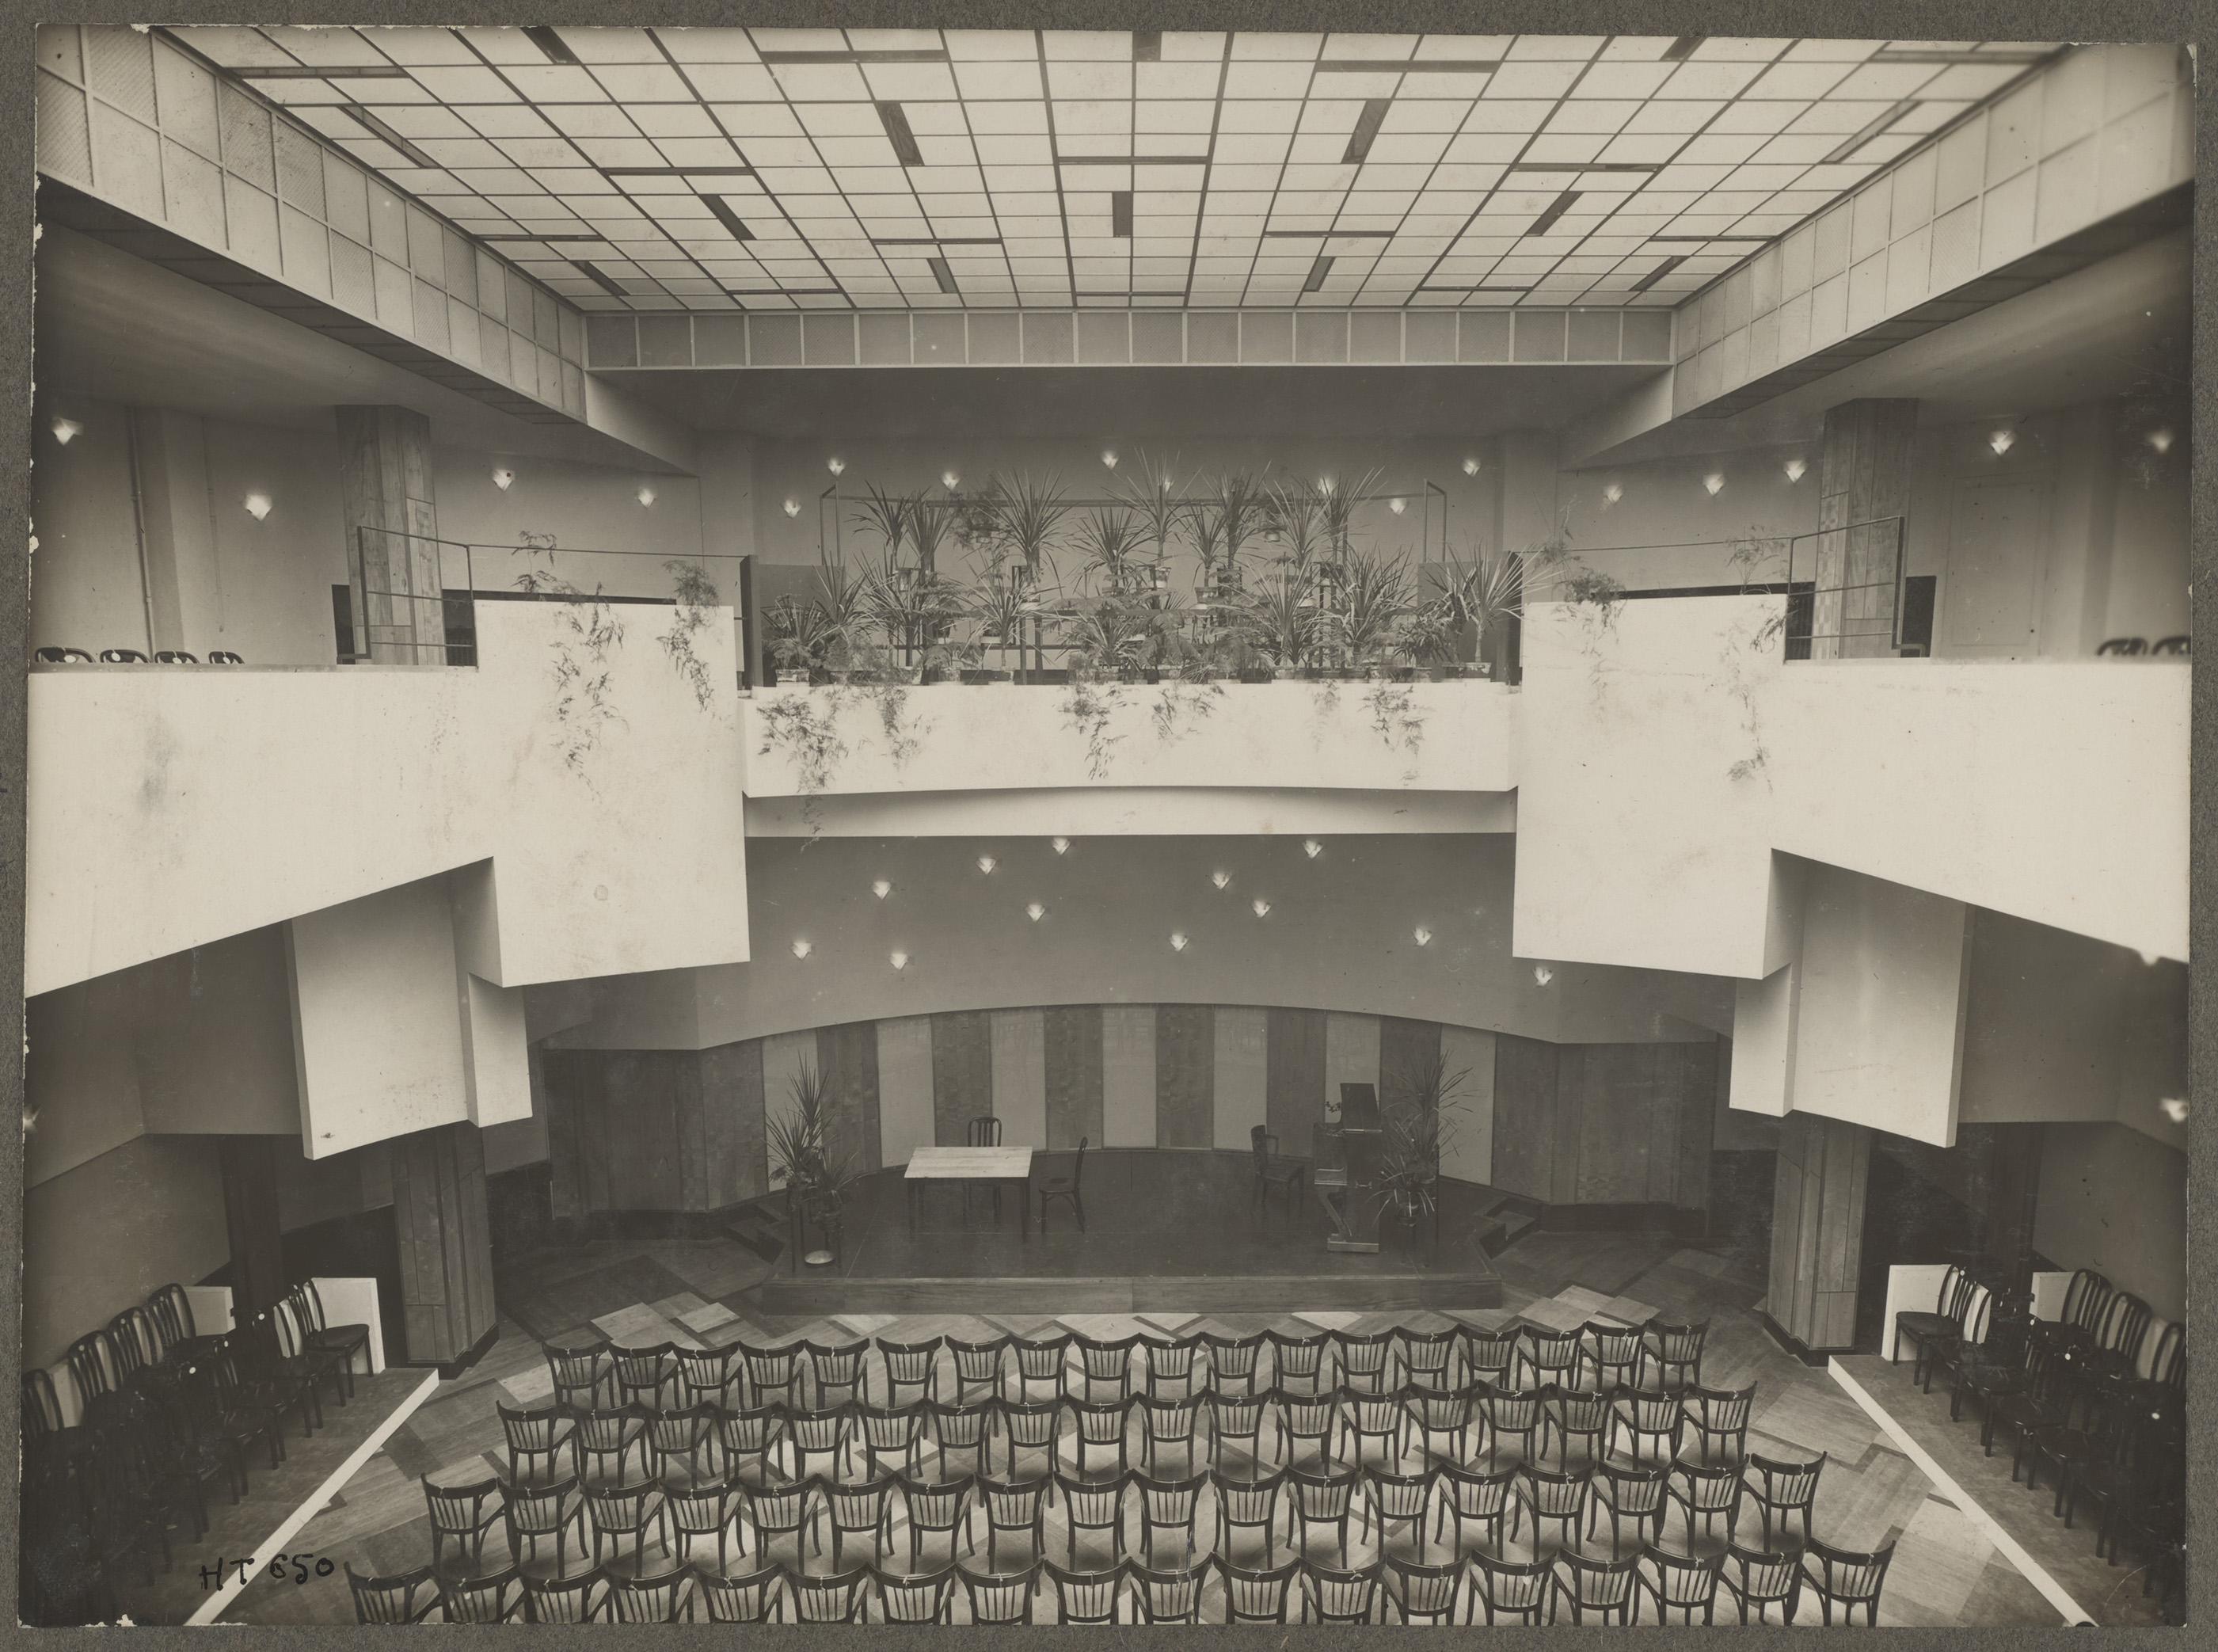 n d inv 29916 4 4 3 dr la salle des f tes du grand h tel de tours 1927 photographie. Black Bedroom Furniture Sets. Home Design Ideas